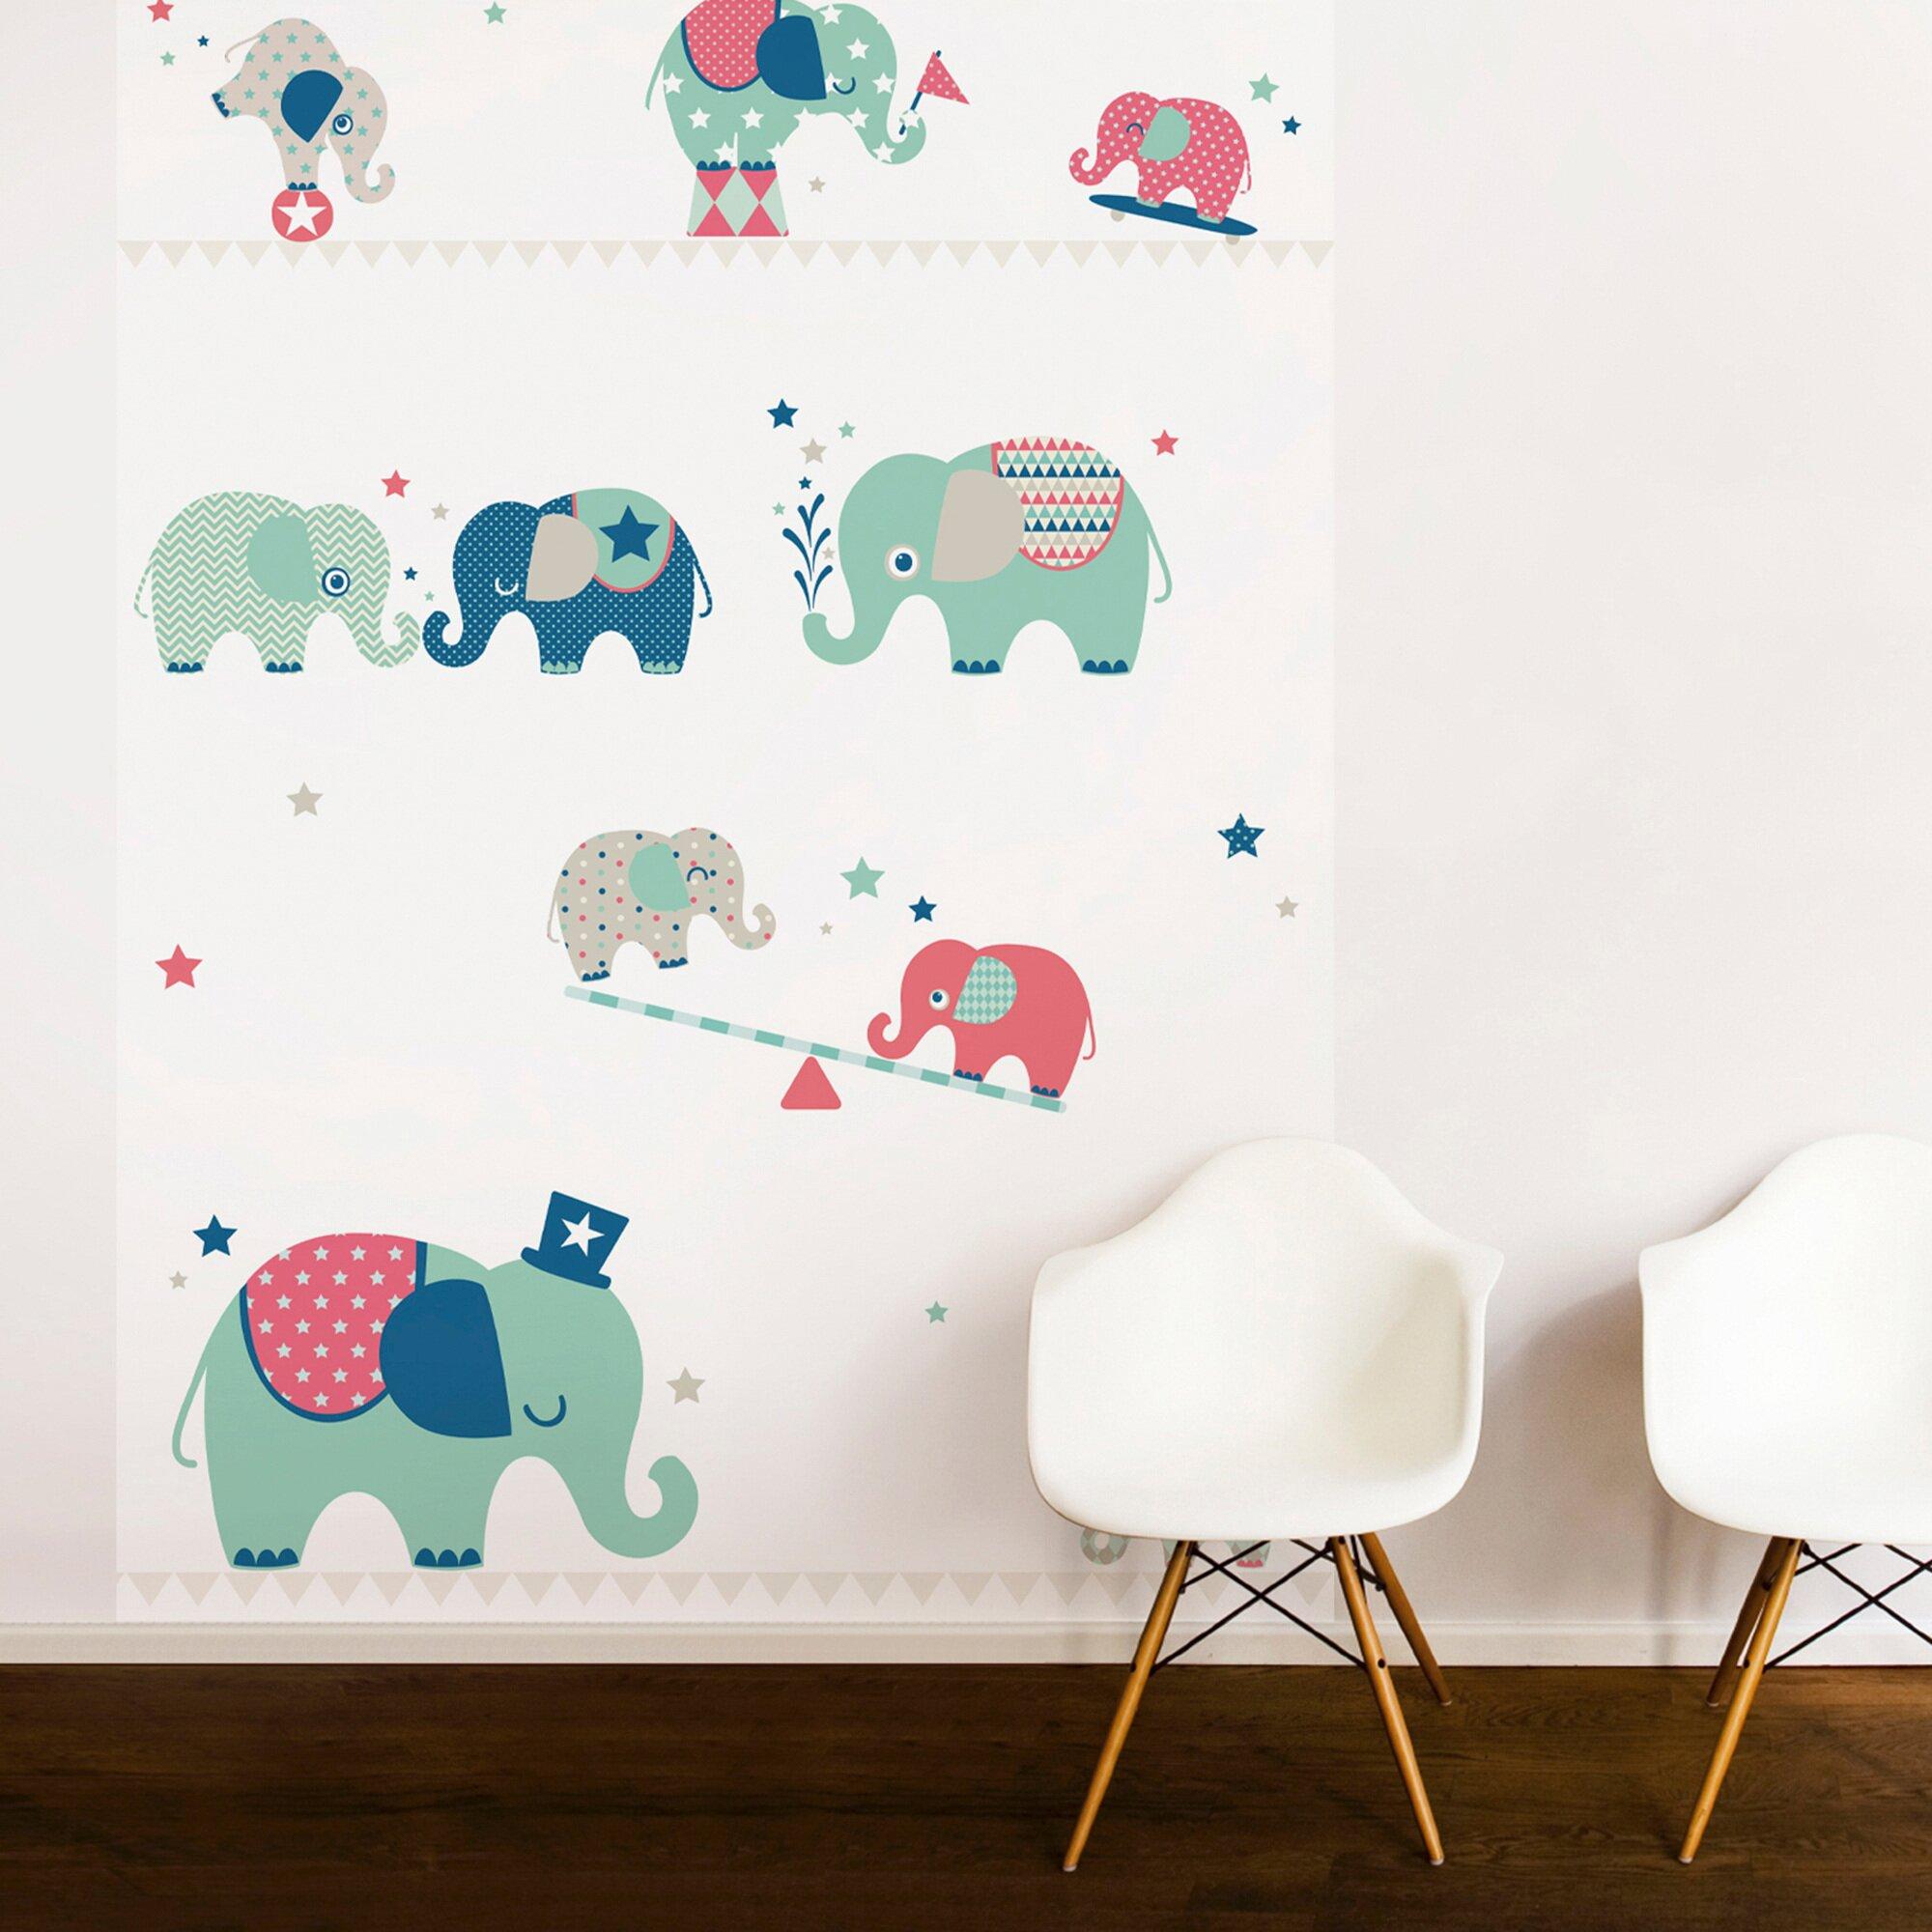 anna-wand-design-tapetenwandbild-elefanten-boys, 129.99 EUR @ babywalz-de